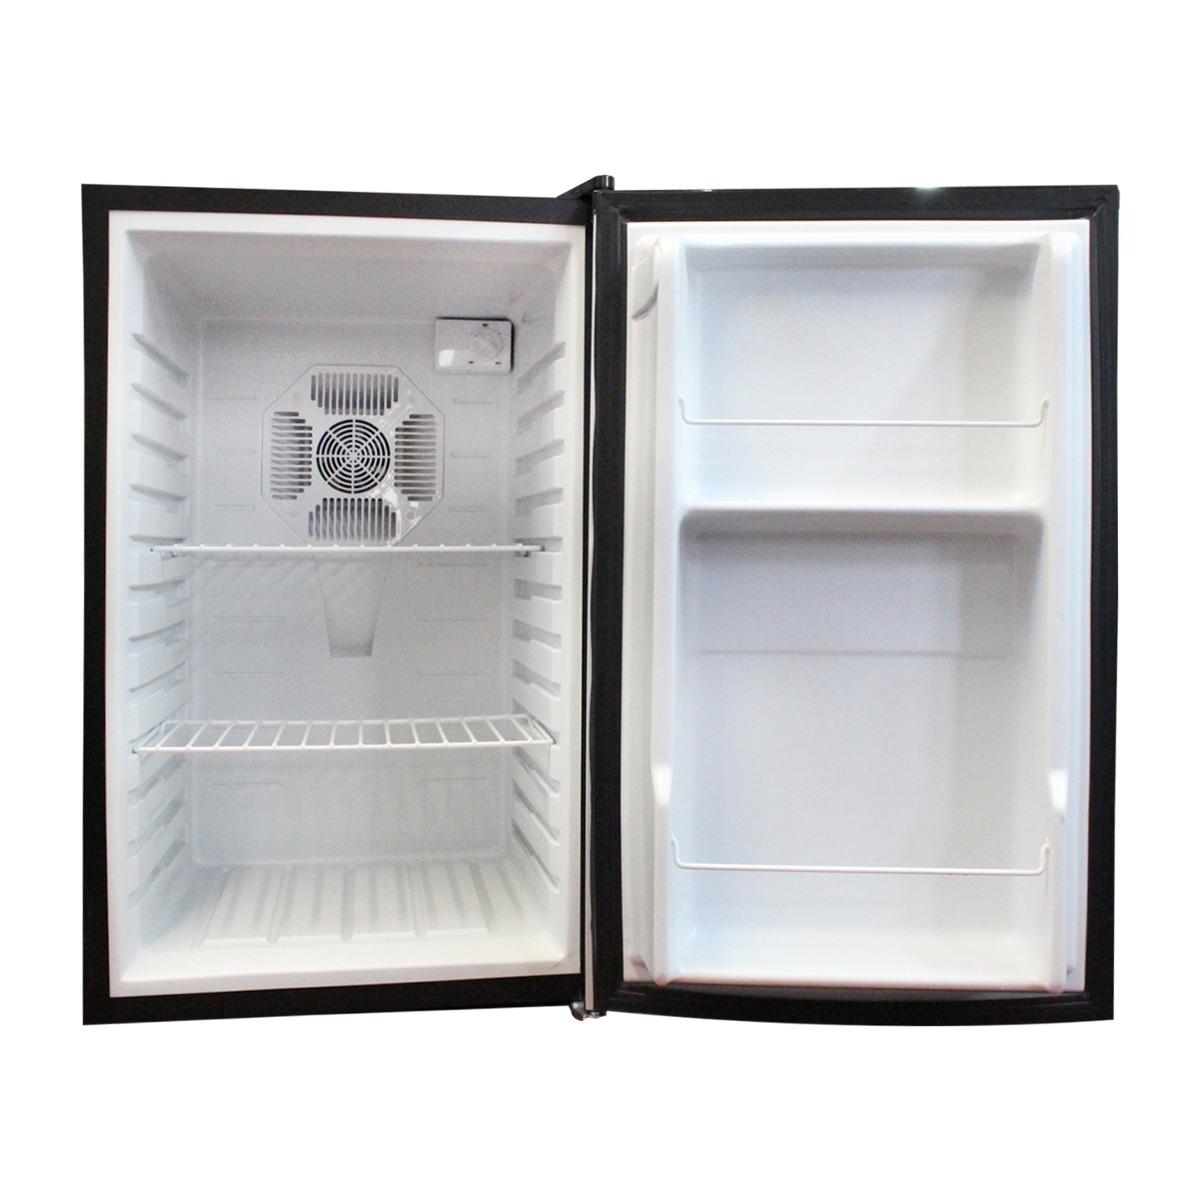 Minibar Frigobar Minirefri Refrigerador Envio Gratis  $ 3,74900 en